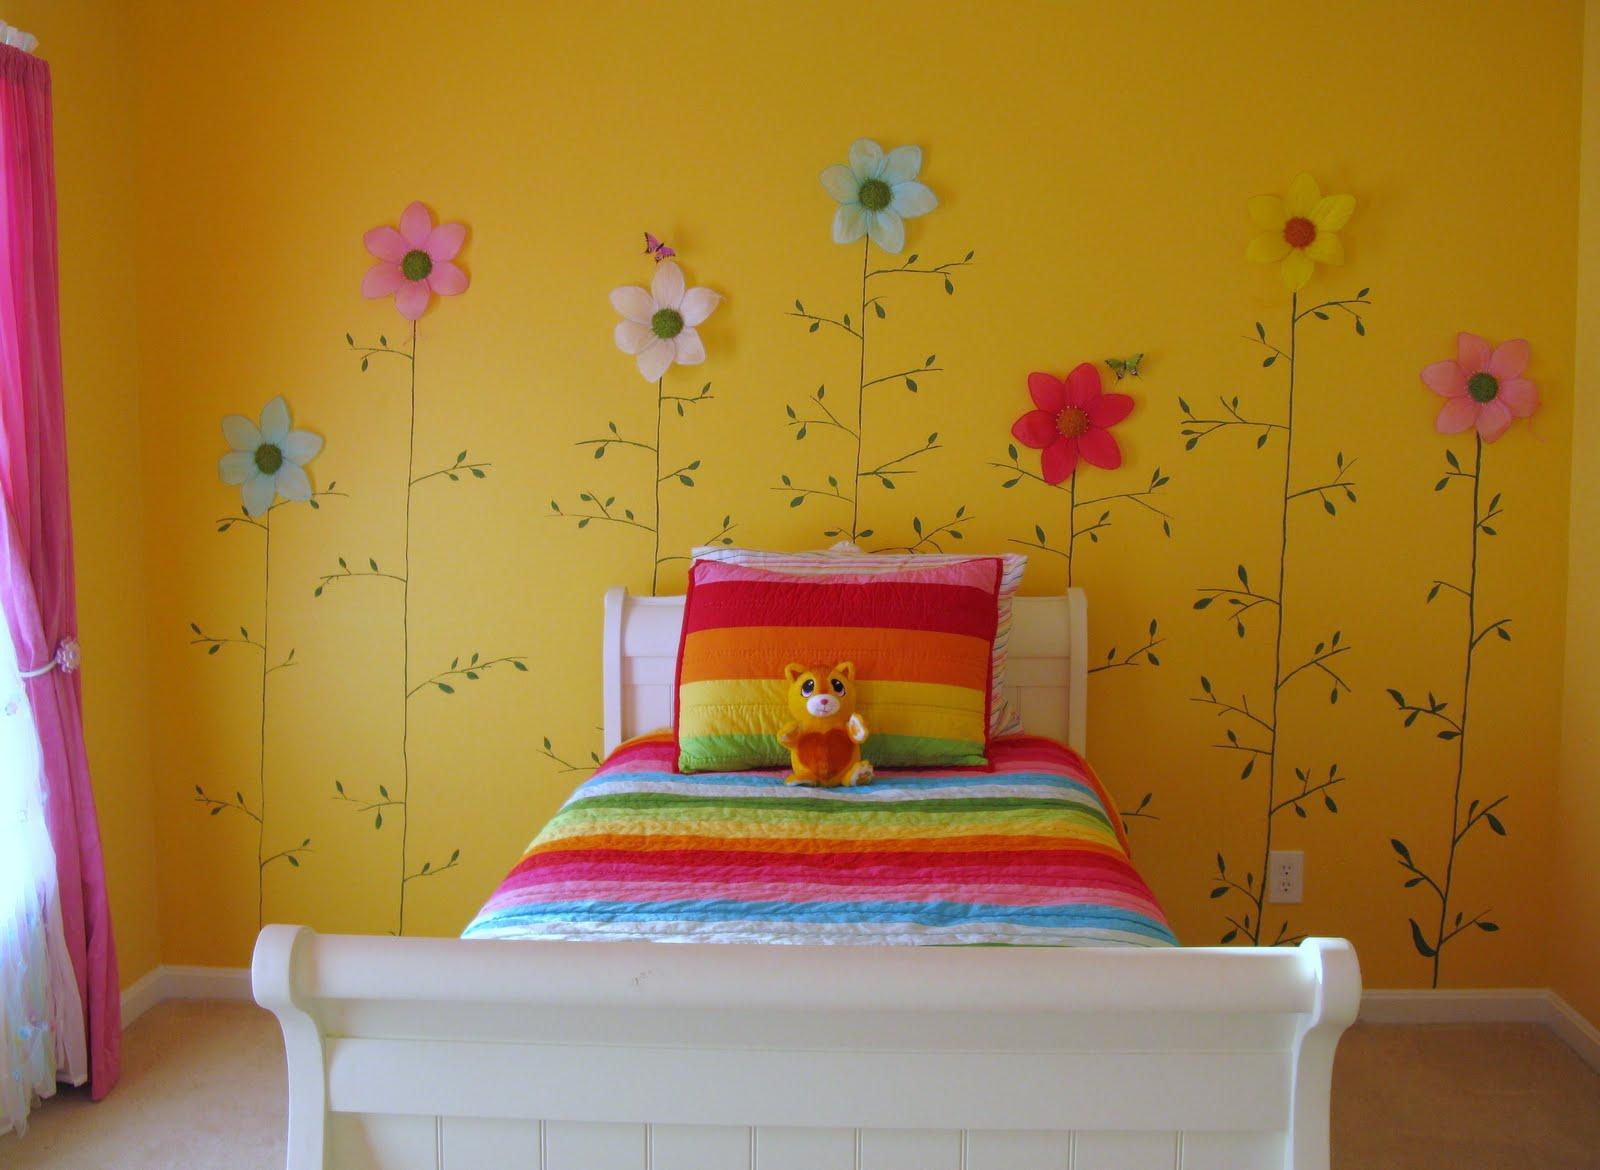 Kids Bedroom Painting Ideas | Wallpress 1080p HD Desktop